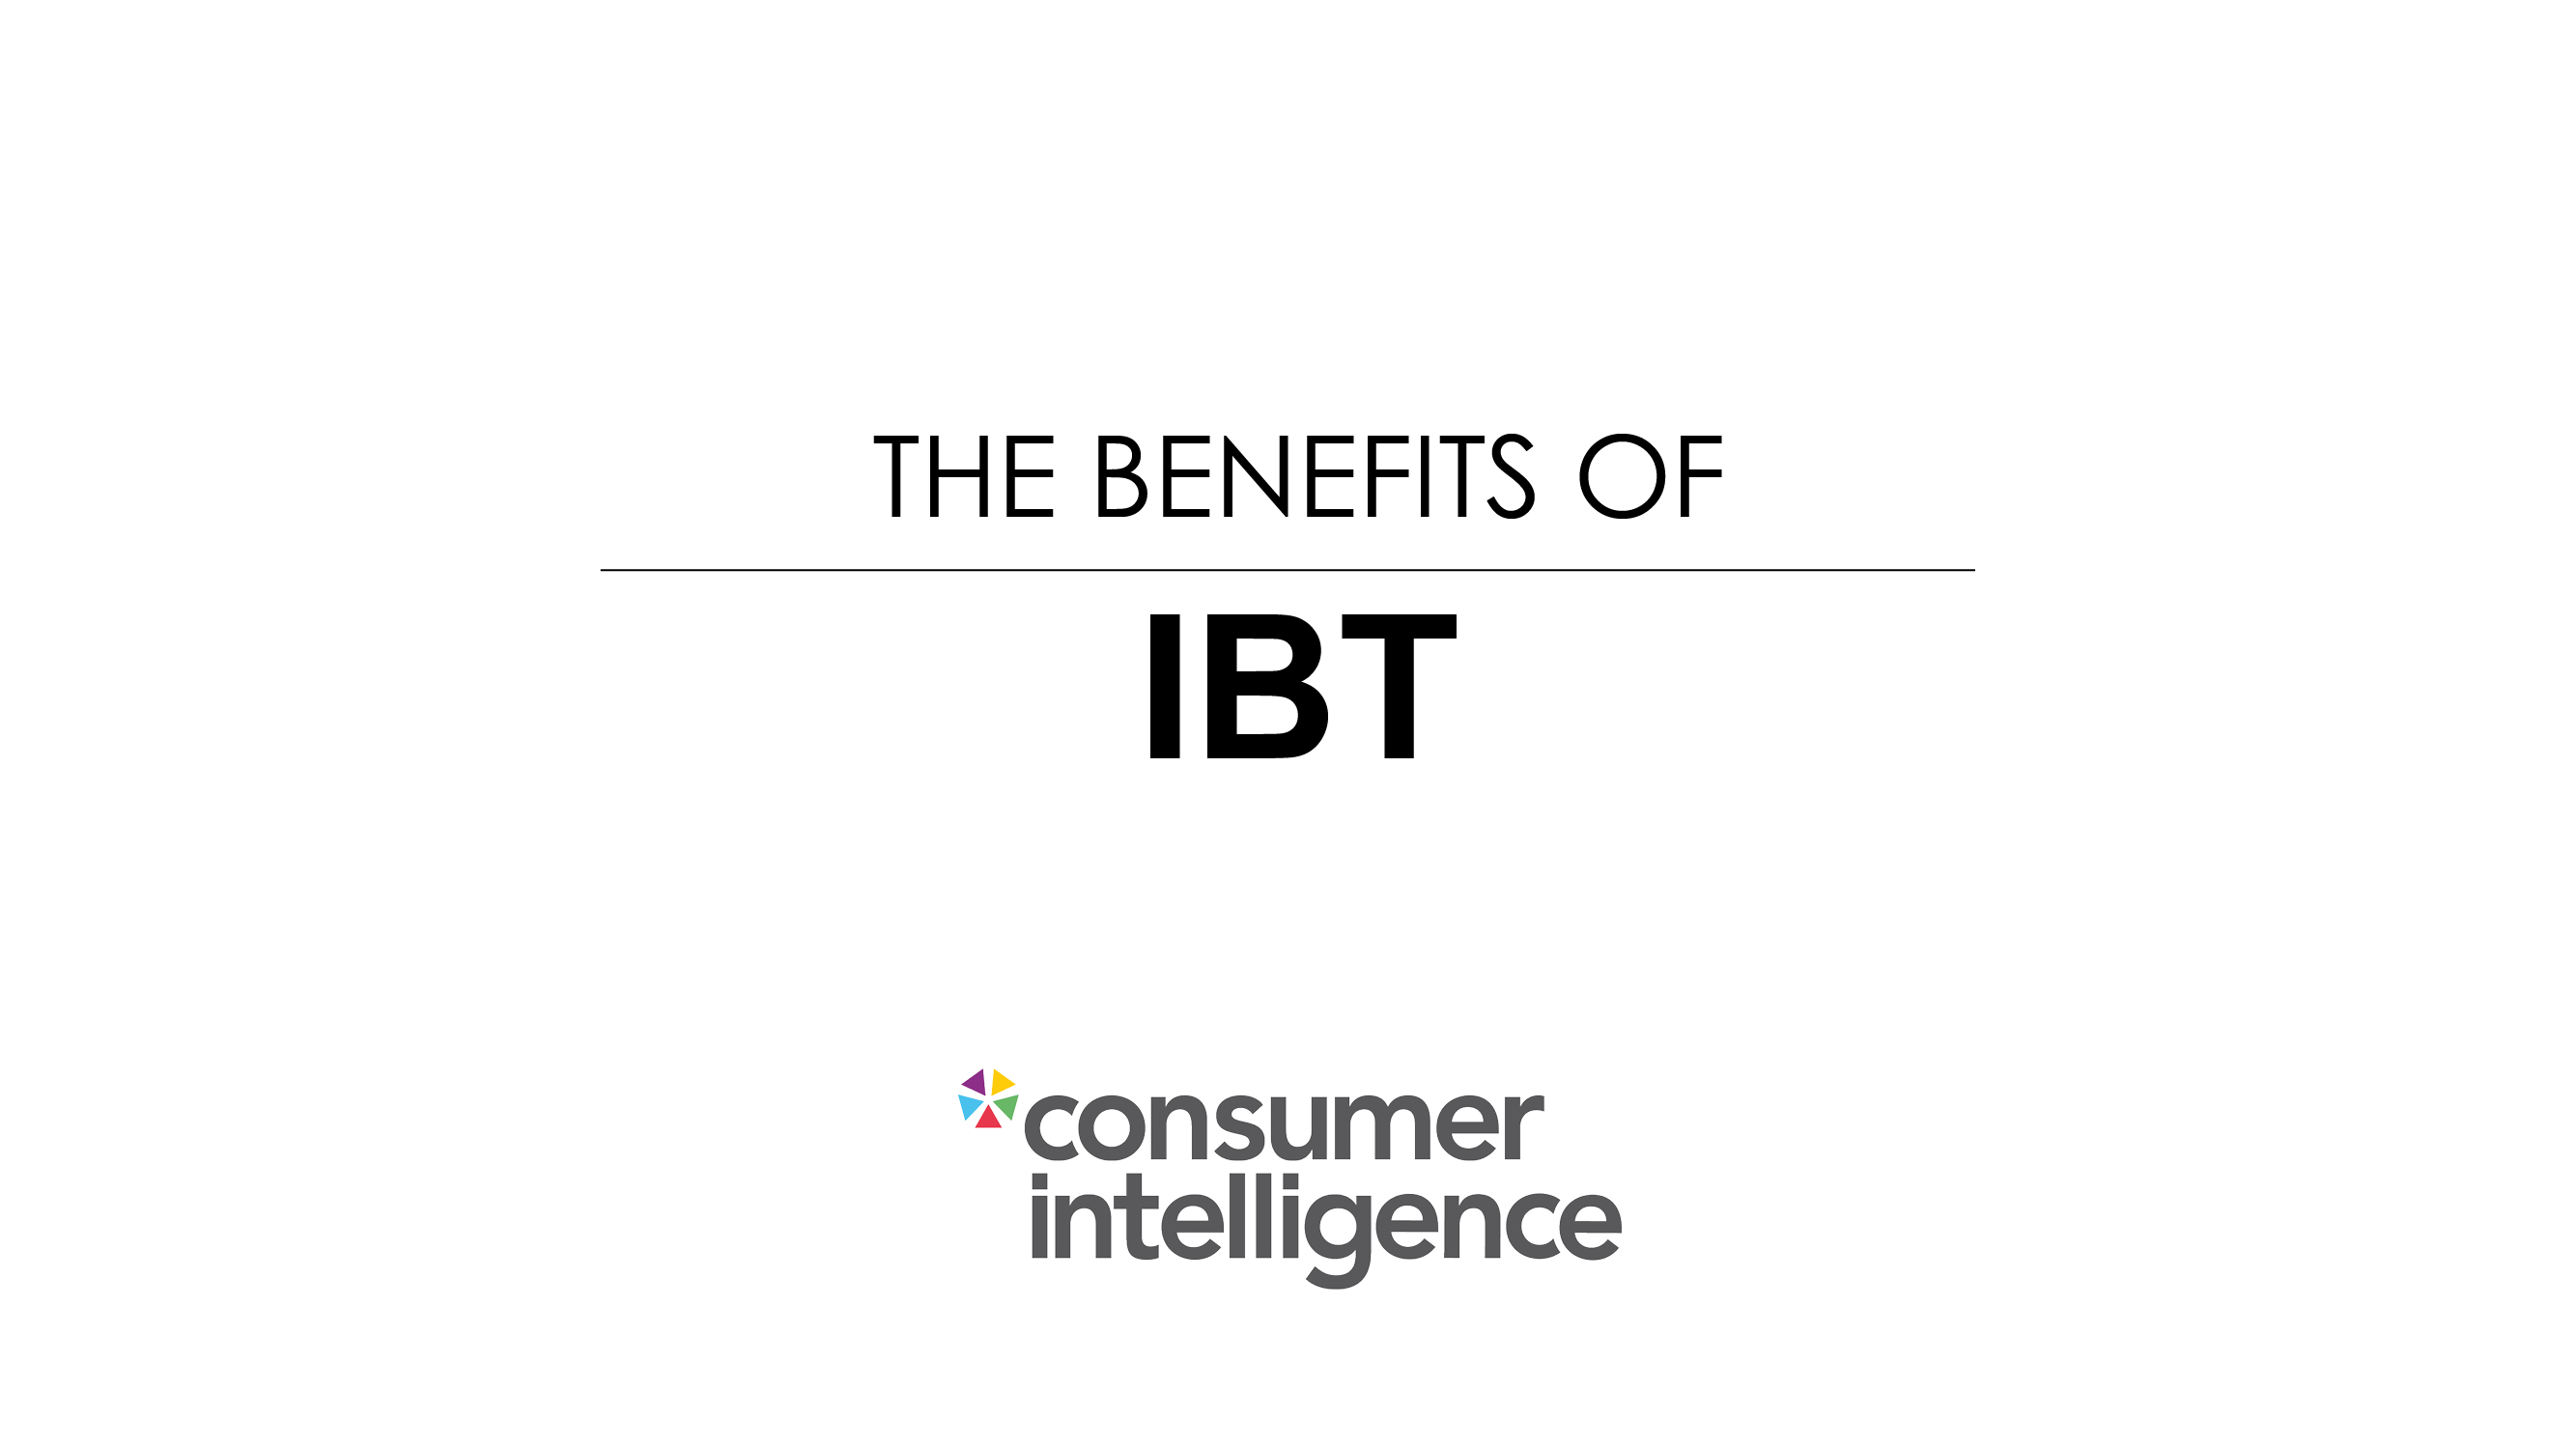 Ian Hughes The Benefits of IBT